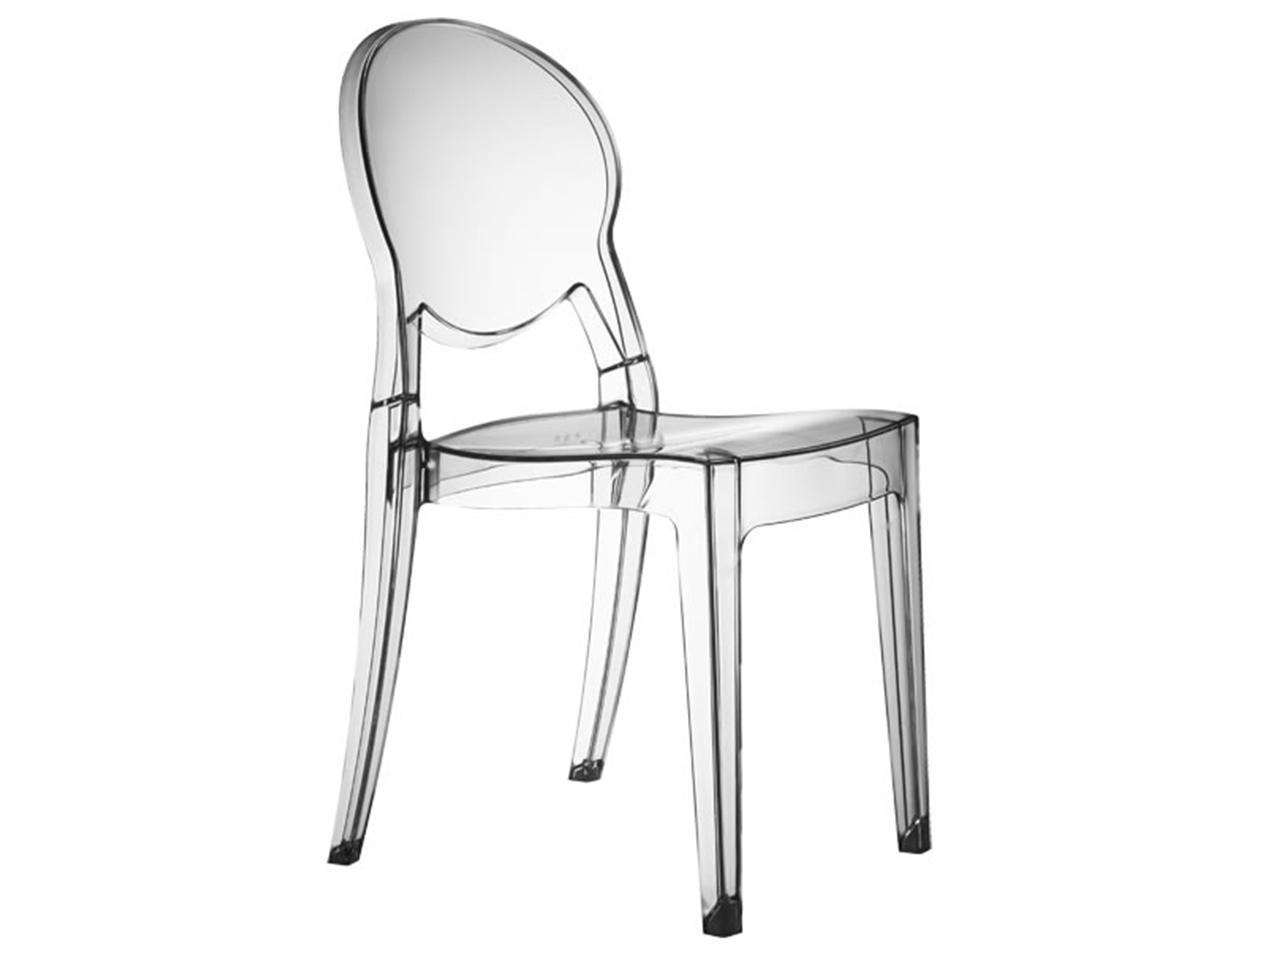 Стул прозрачный огнестойкий Igloo Chair